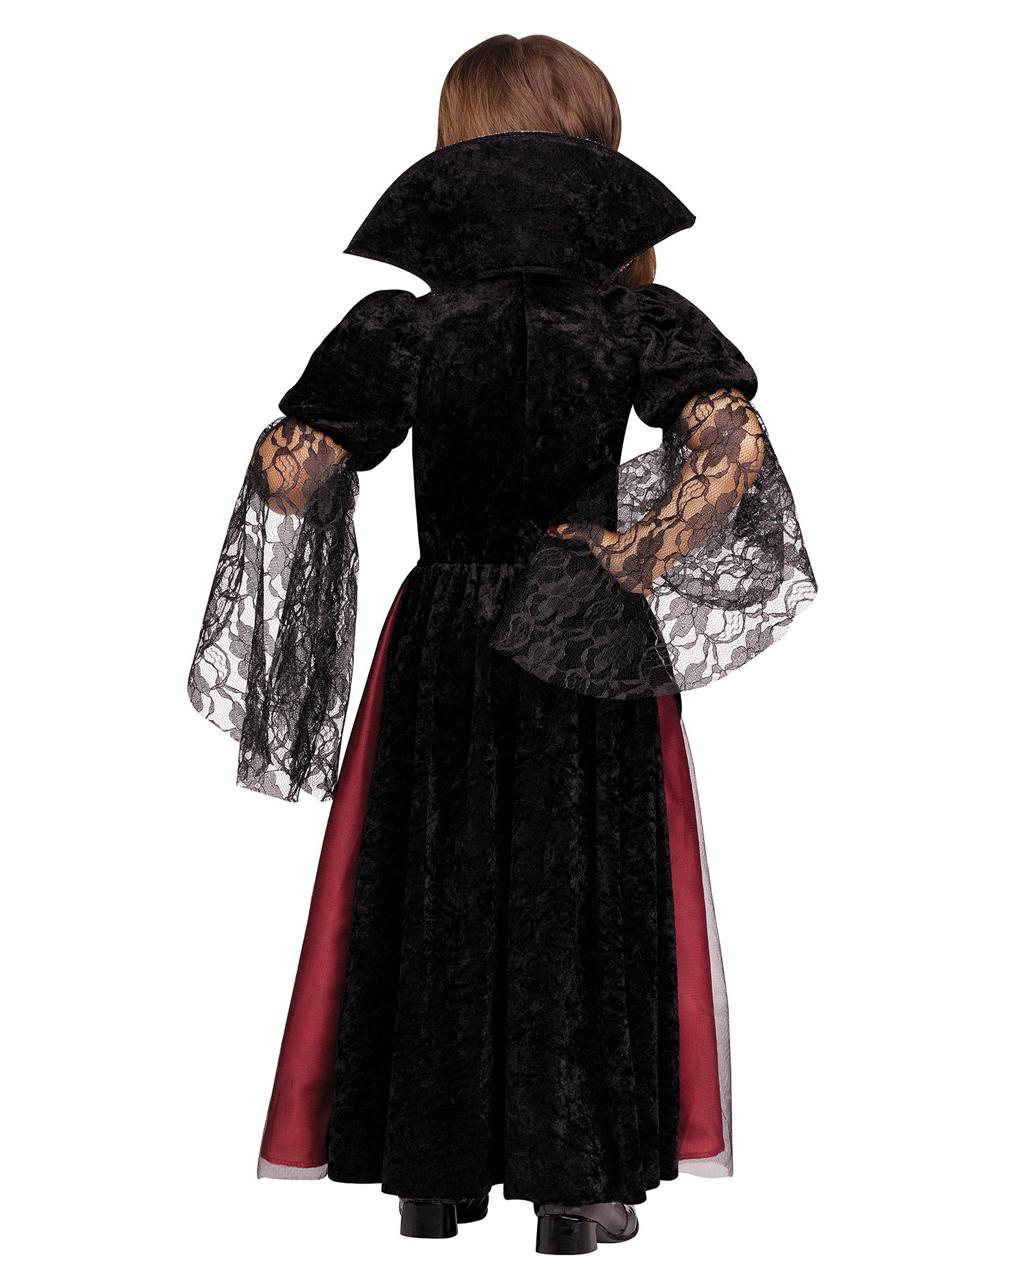 vampir princess kleinkinderkost m f r fasching karneval universe. Black Bedroom Furniture Sets. Home Design Ideas